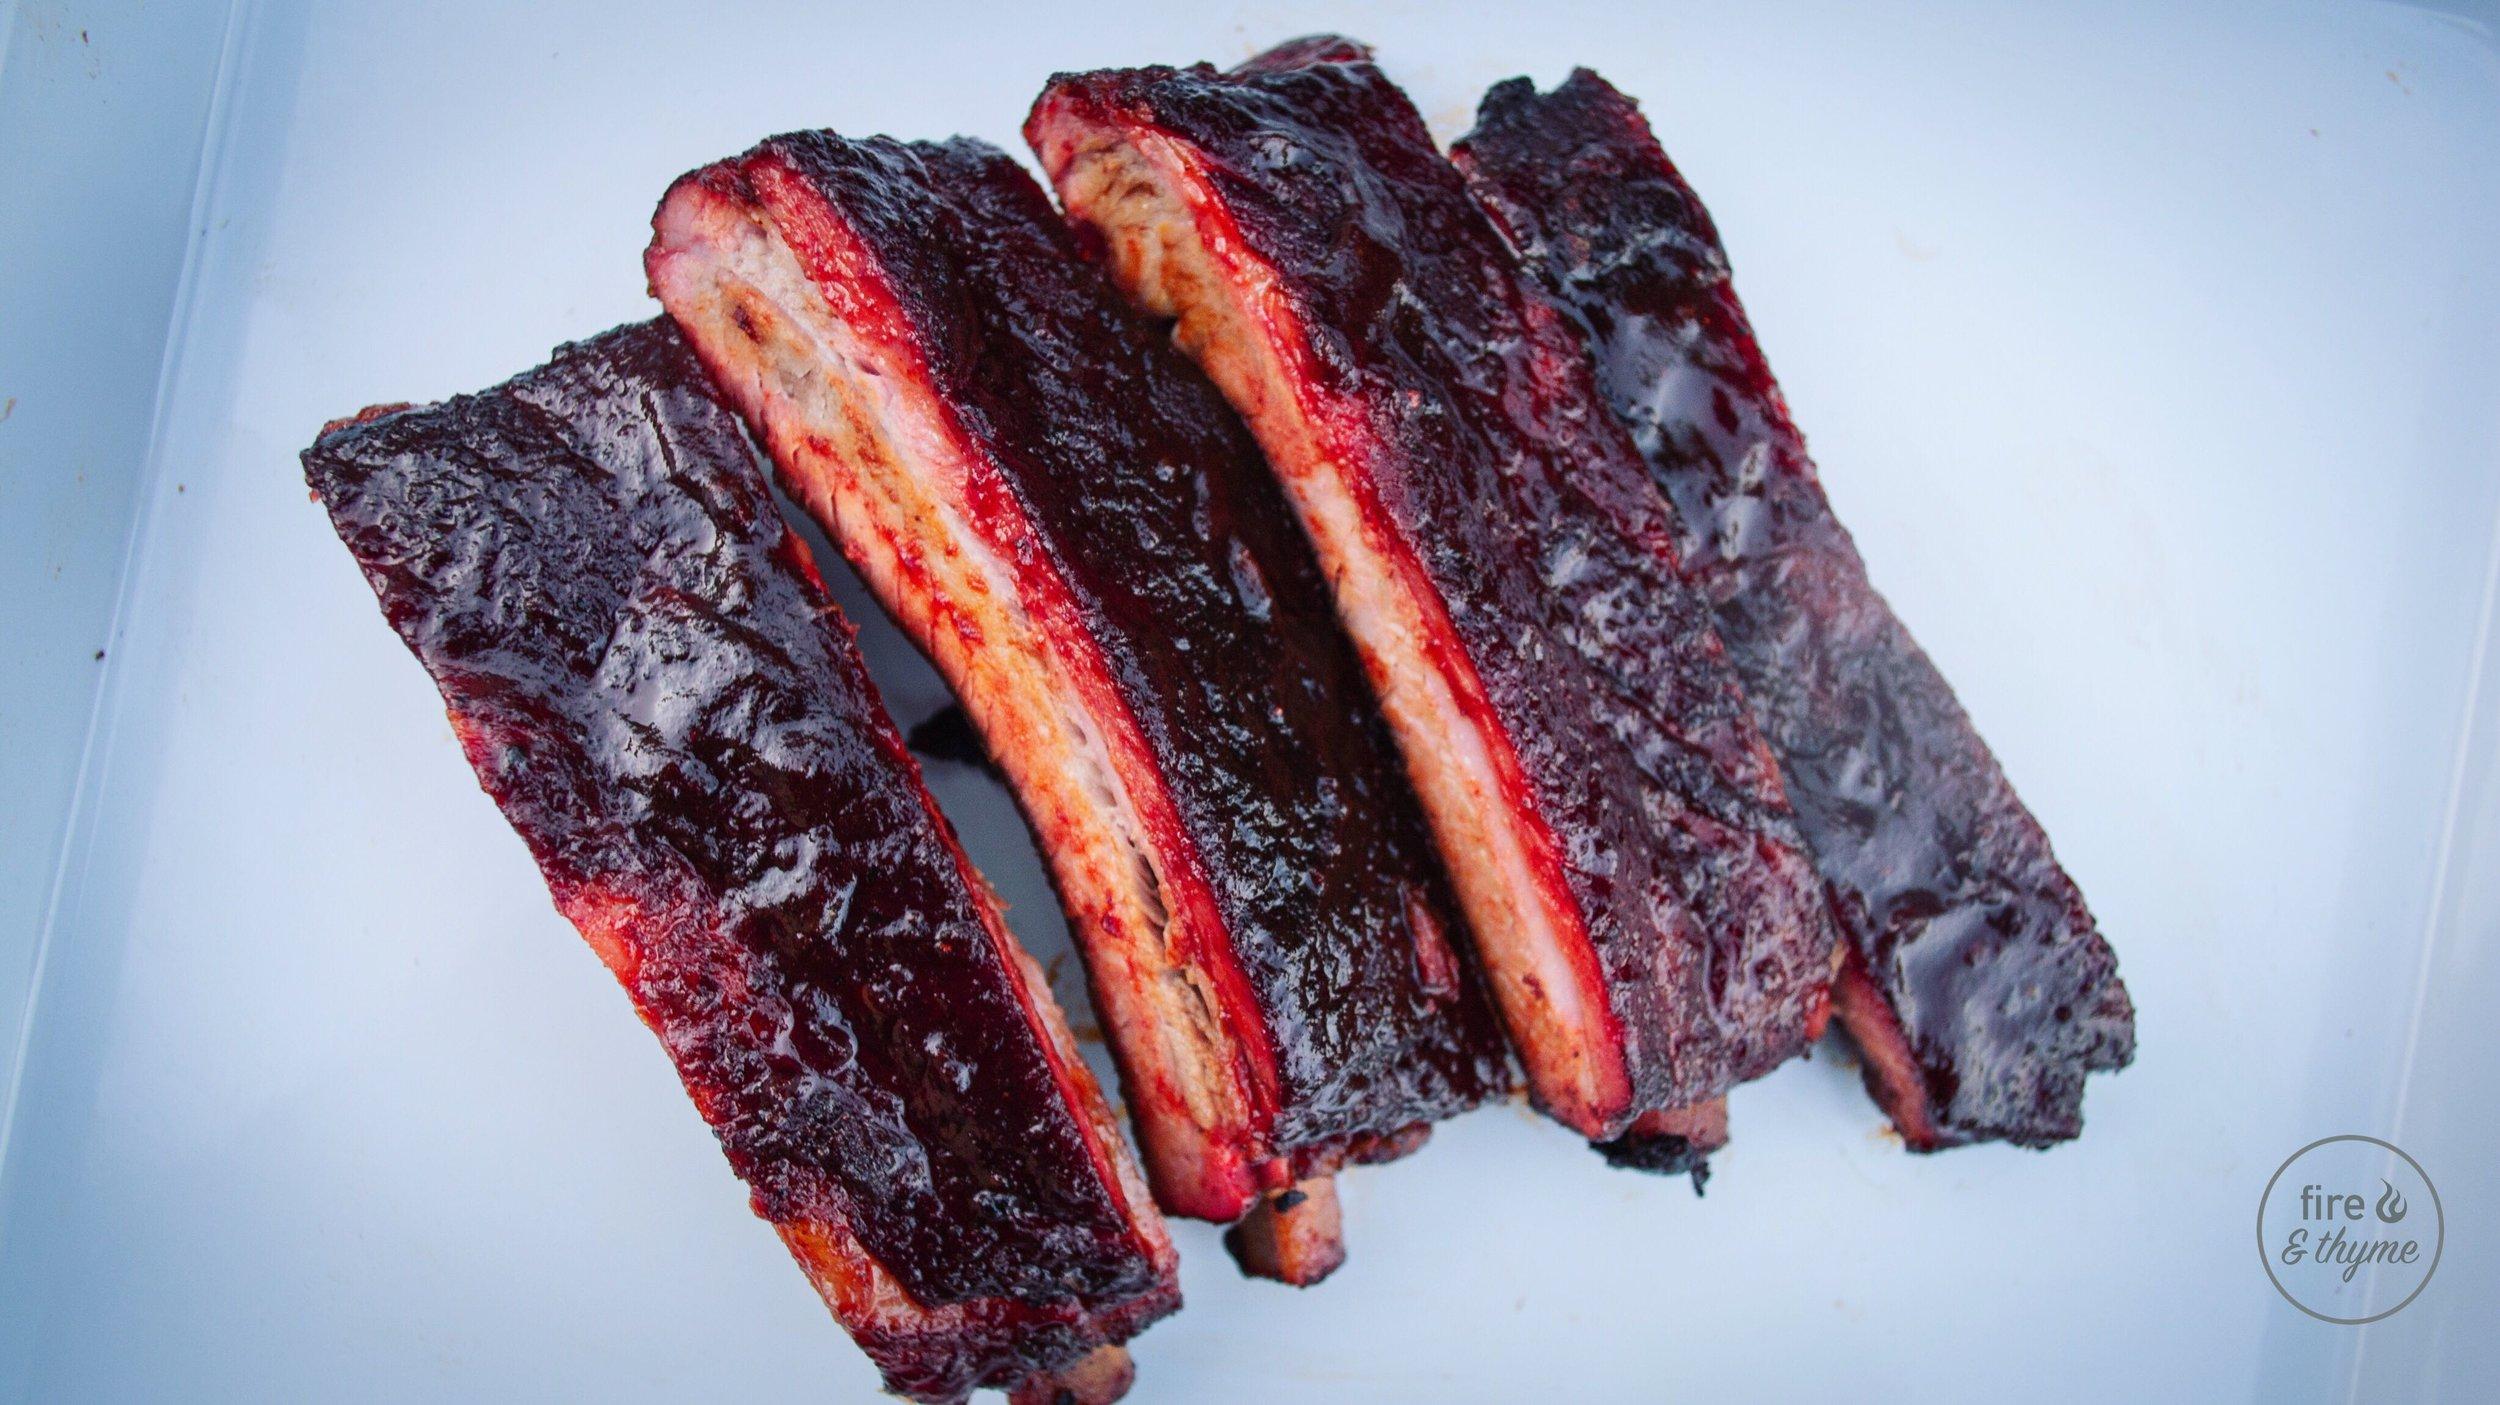 ribs served